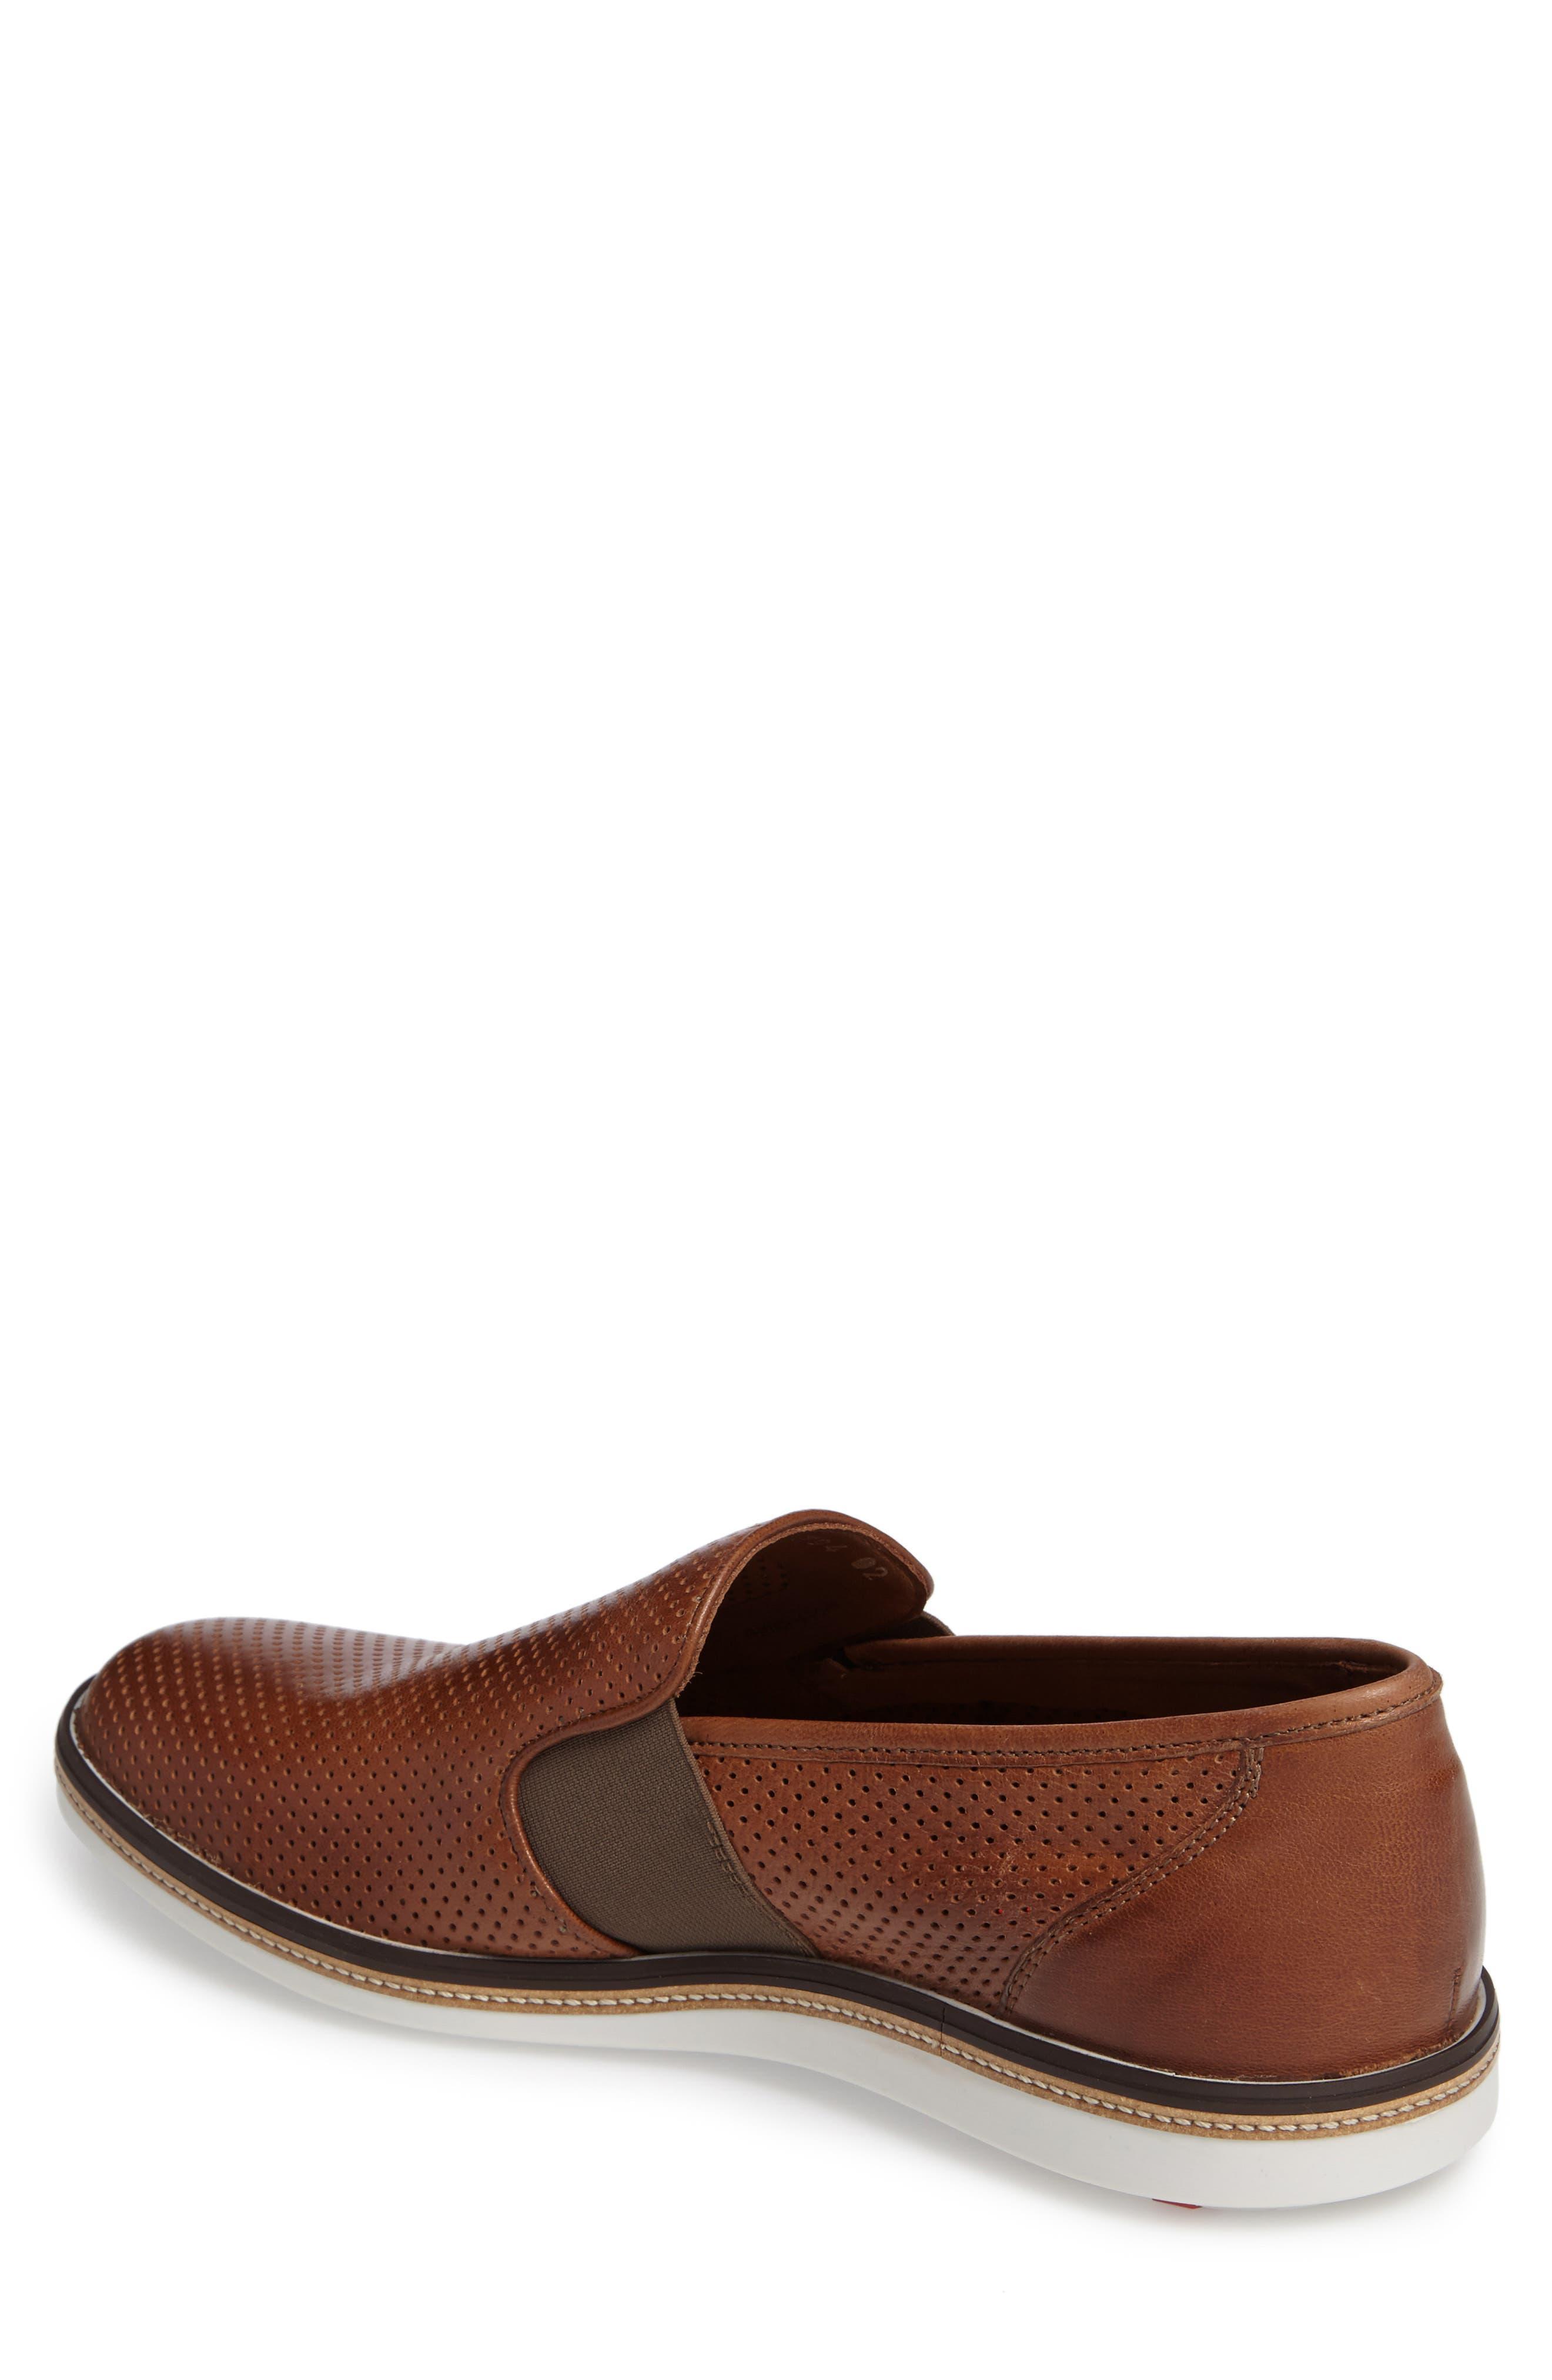 Alternate Image 2  - Lloyd Alister Perforated Loafer (Men)